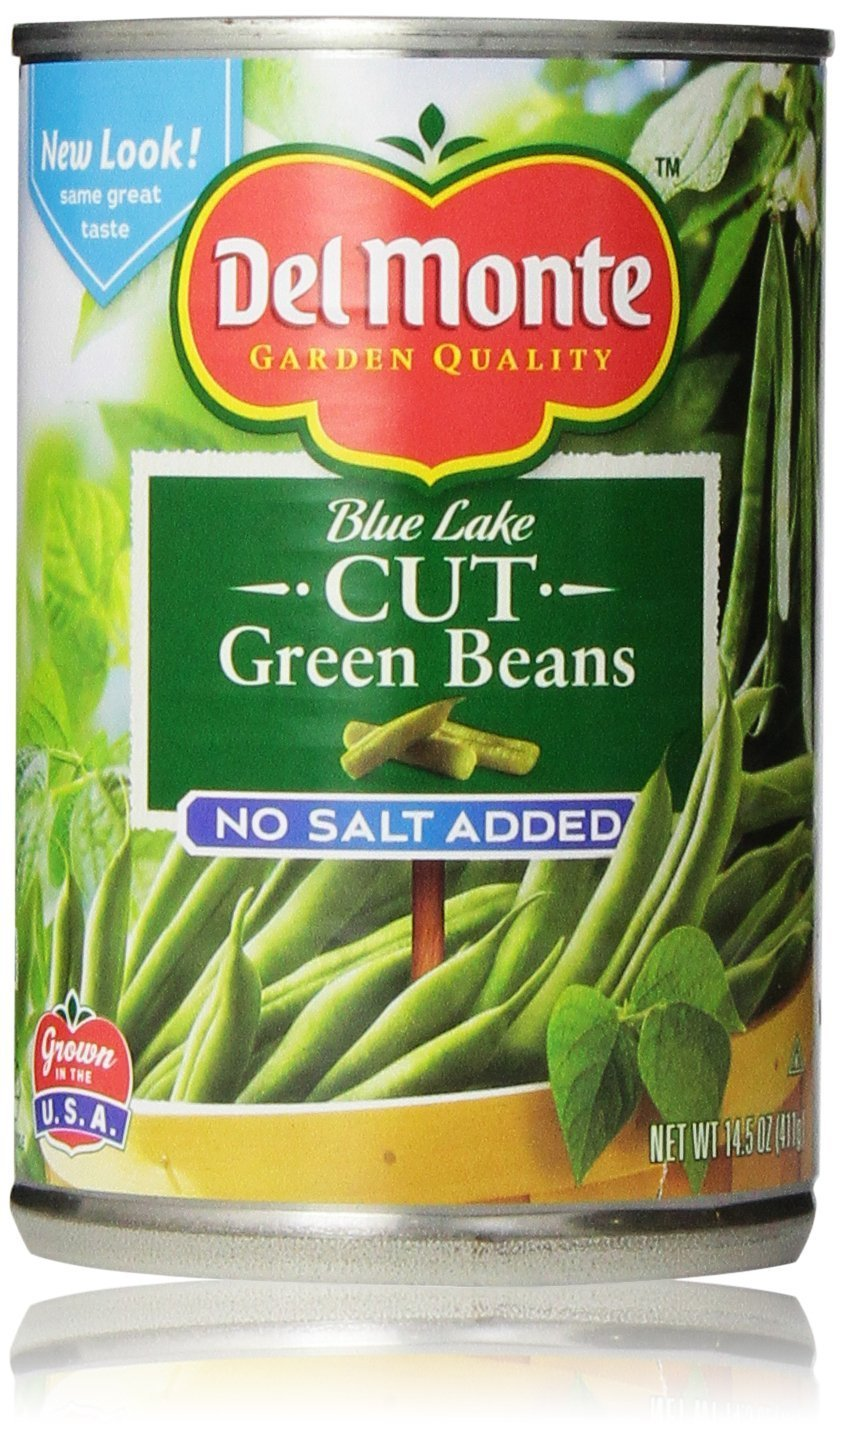 Del Monte Blue Lake Cut Green Beans, No Salt Added 14.5 Oz (Pack of 6)